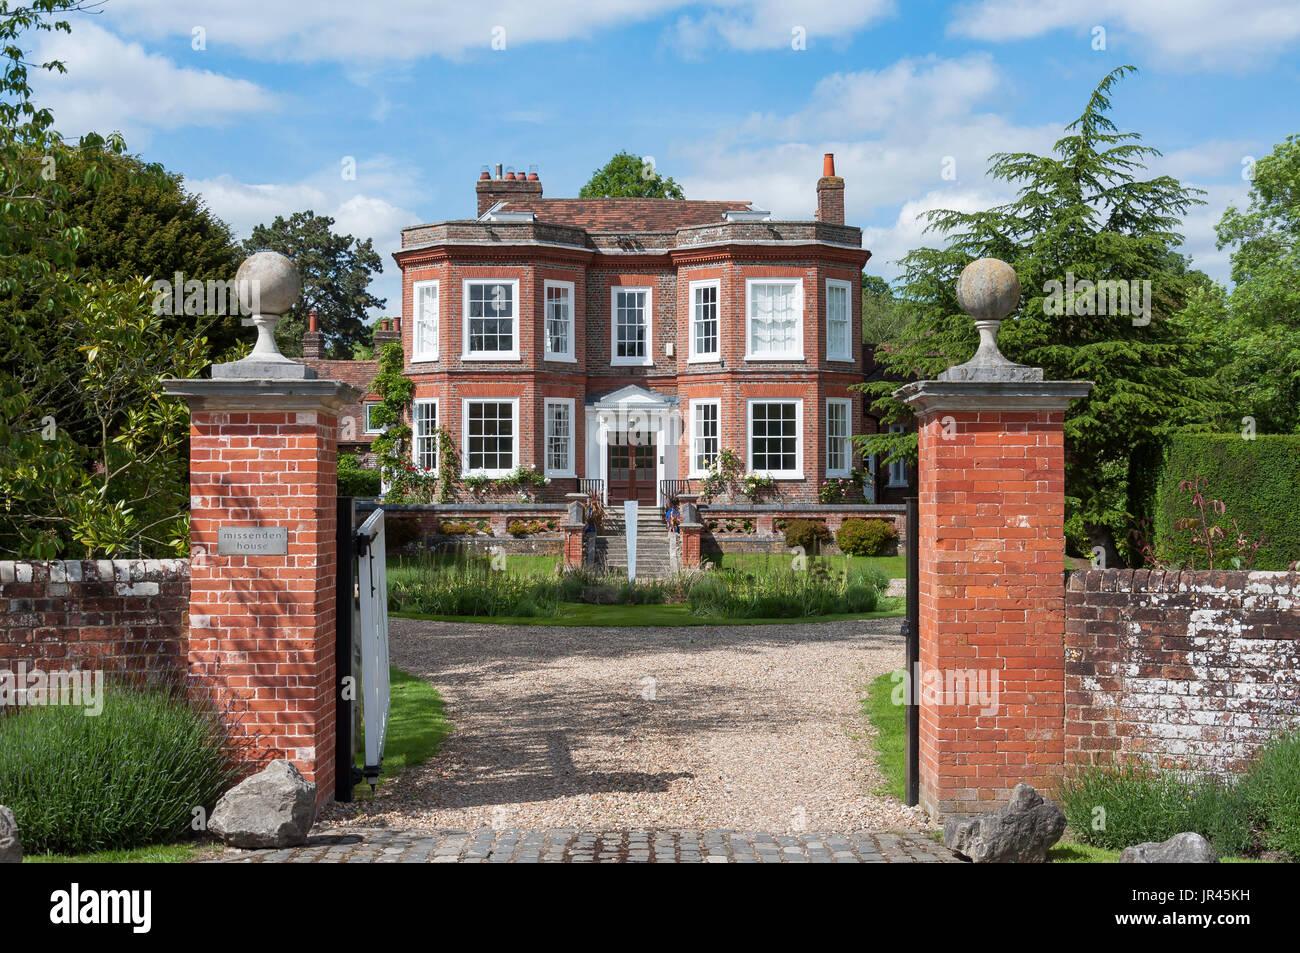 Missenden House, Highmore Cottages, Little Missenden, Buckinghamshire, England, United Kingdom - Stock Image